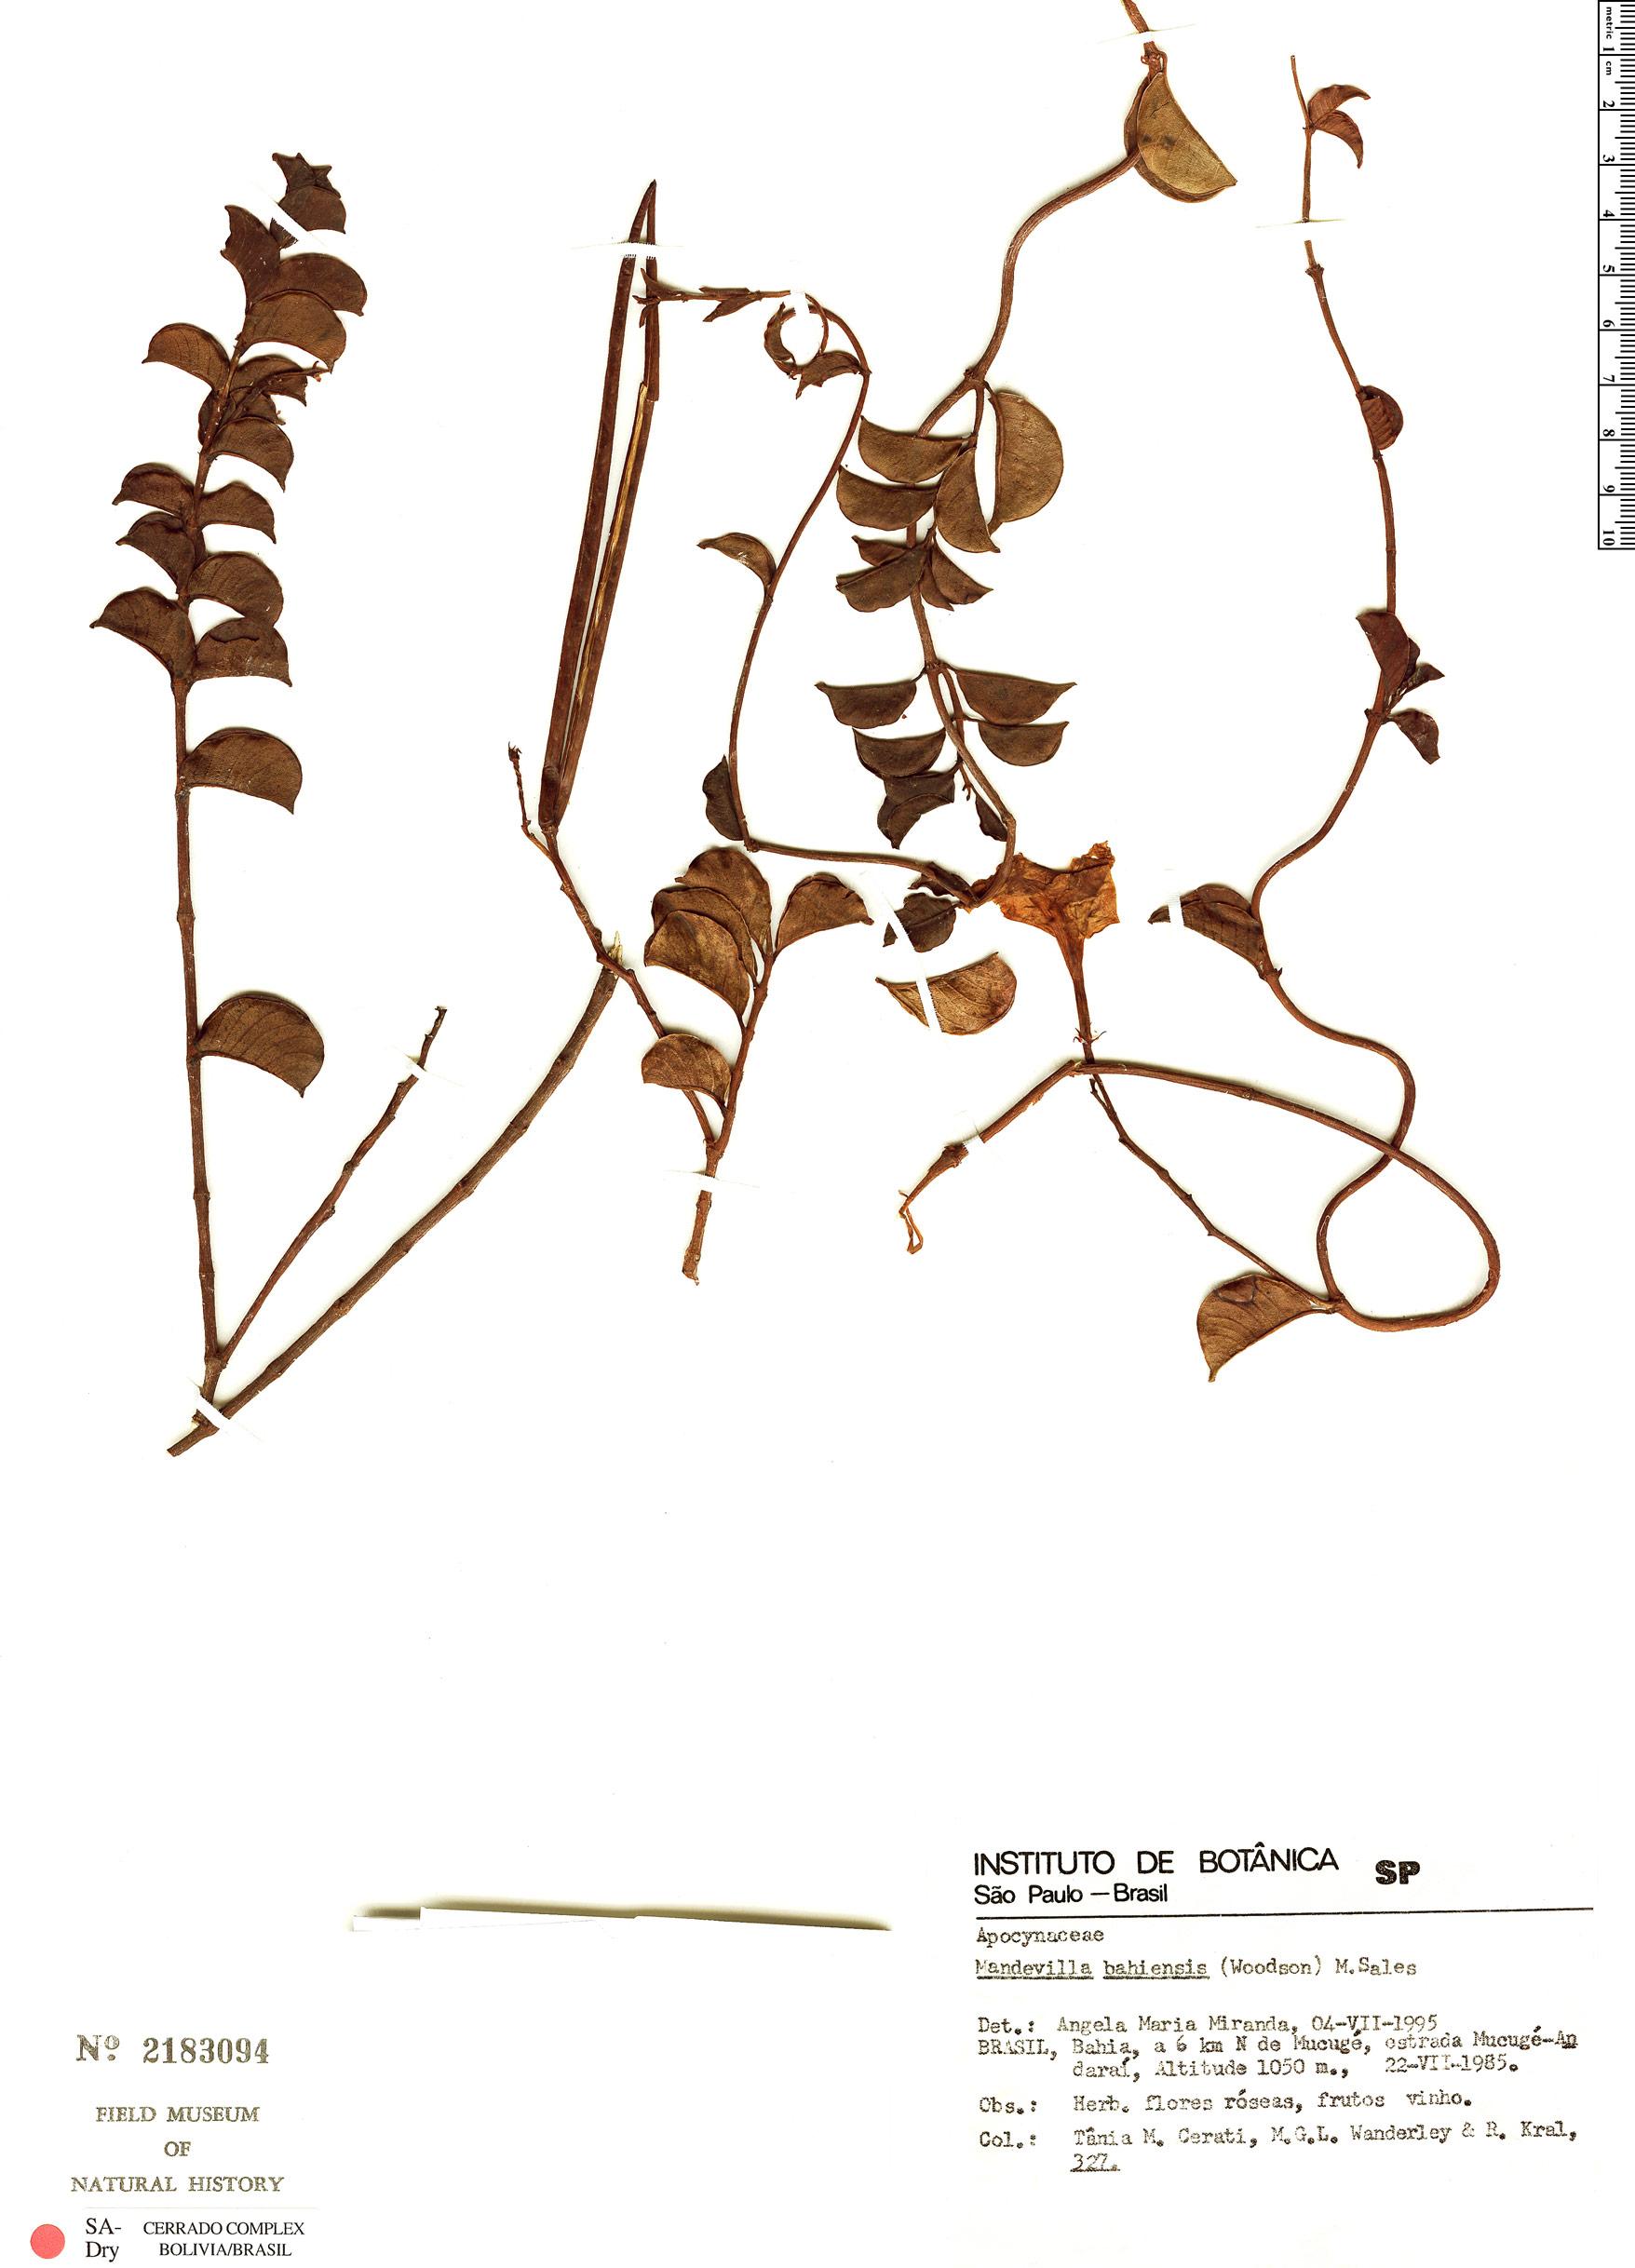 Specimen: Mandevilla bahiensis